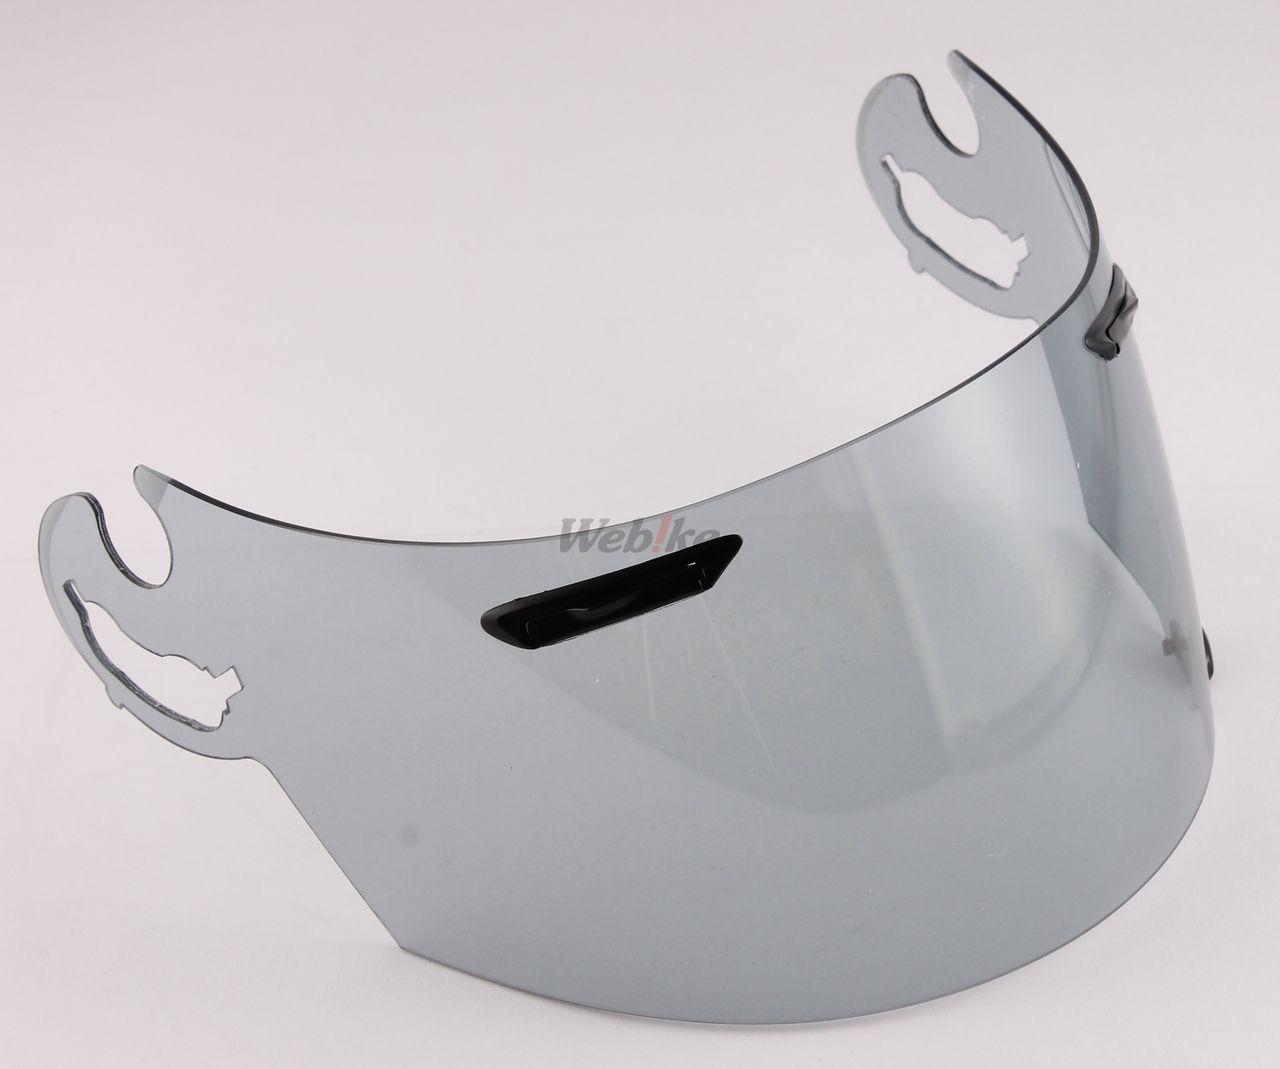 【Arai】Super adsis L安全帽鏡片 - 「Webike-摩托百貨」